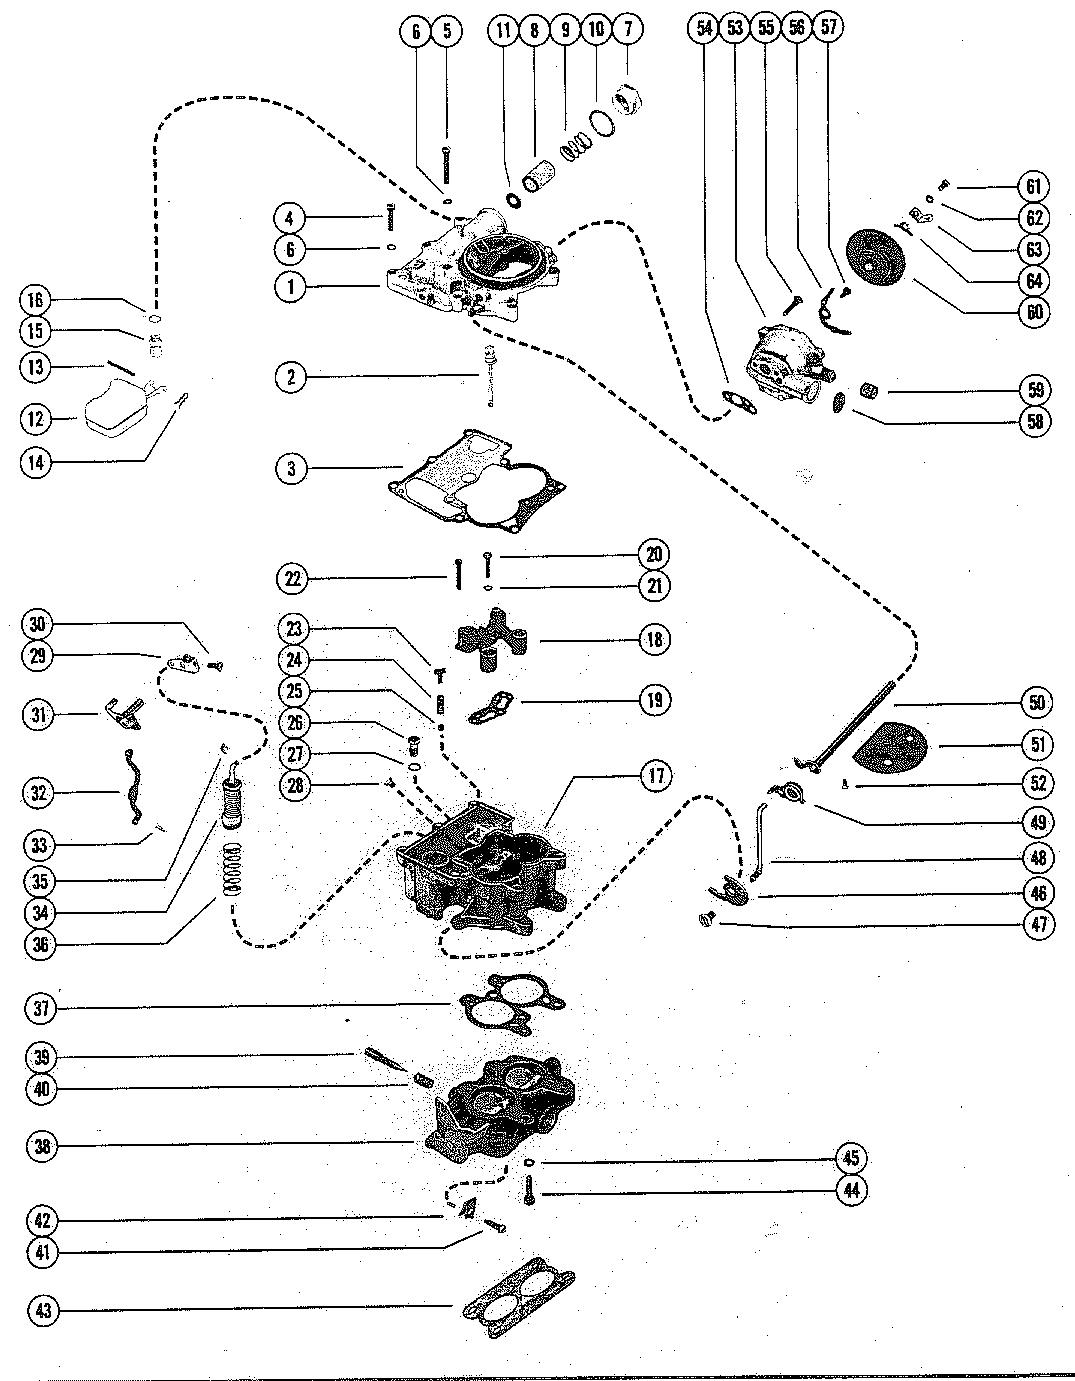 CARBURETOR ASSEMBLY FOR MERCRUISER 485 ENGINE